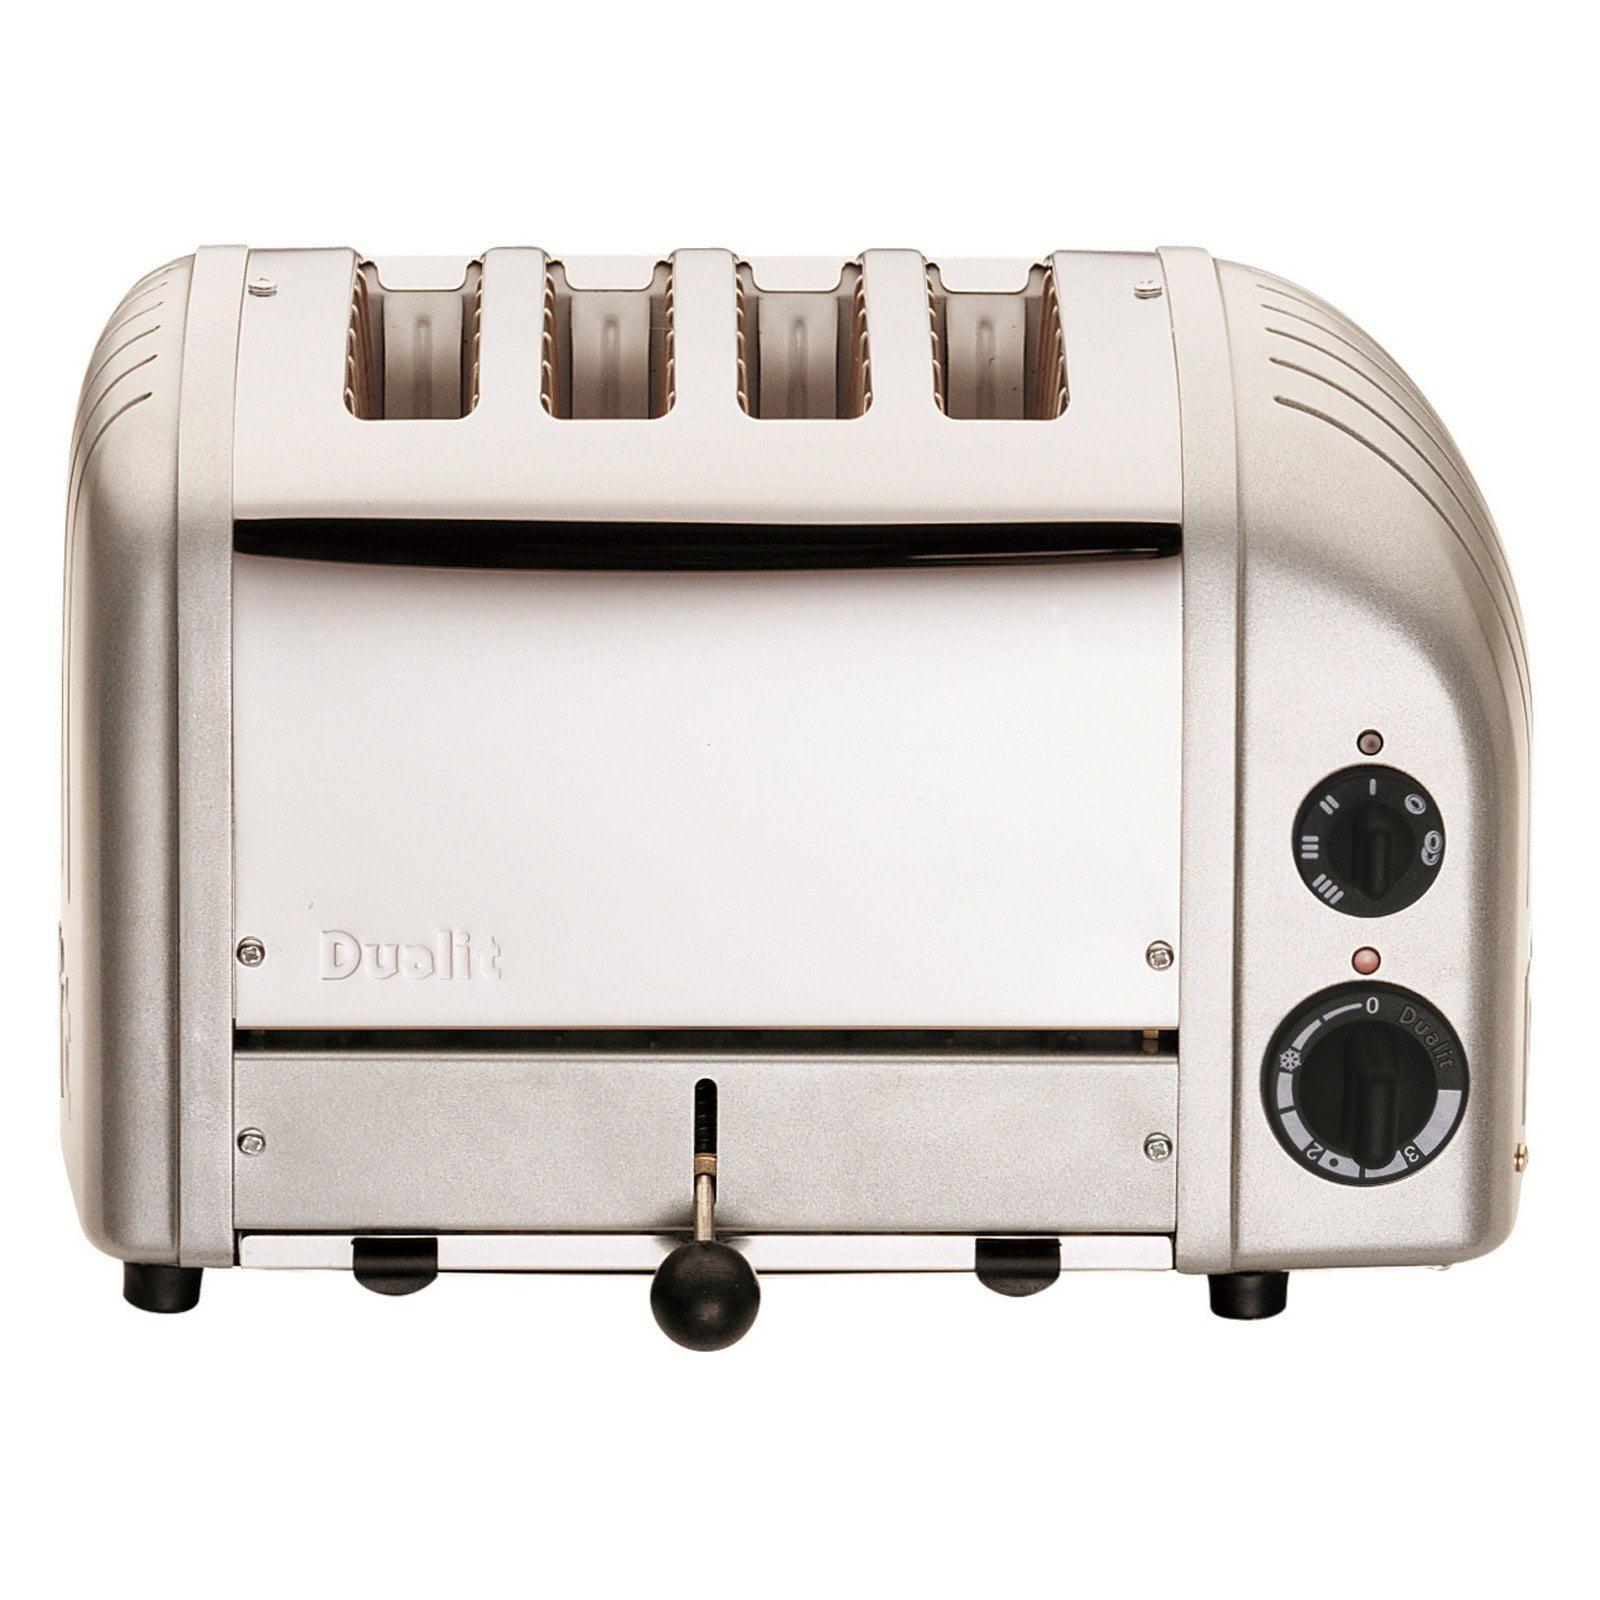 Dualit 47162 4 Slice NewGen Toaster - Metallic Silver